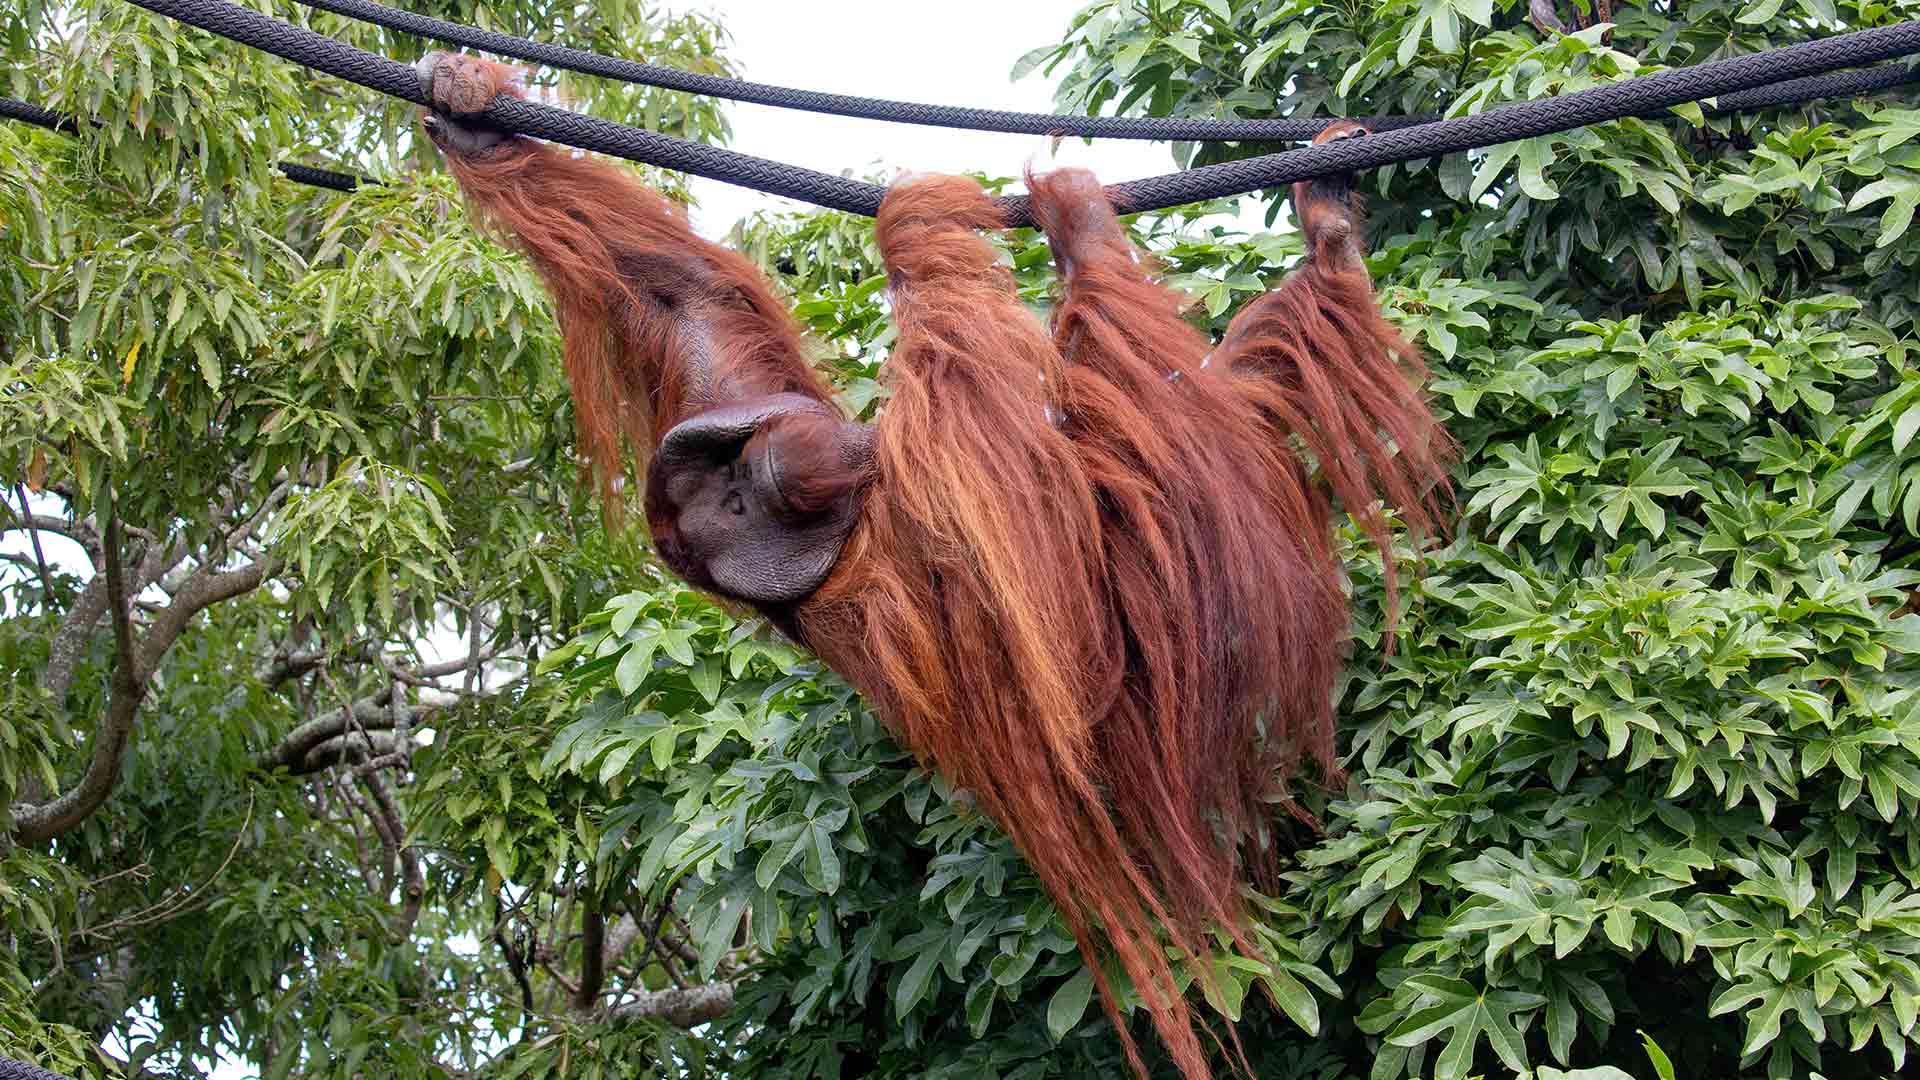 https://rfacdn.nz/zoo/assets/media/charlie-orangutan-sea-animal-pages-2.jpg